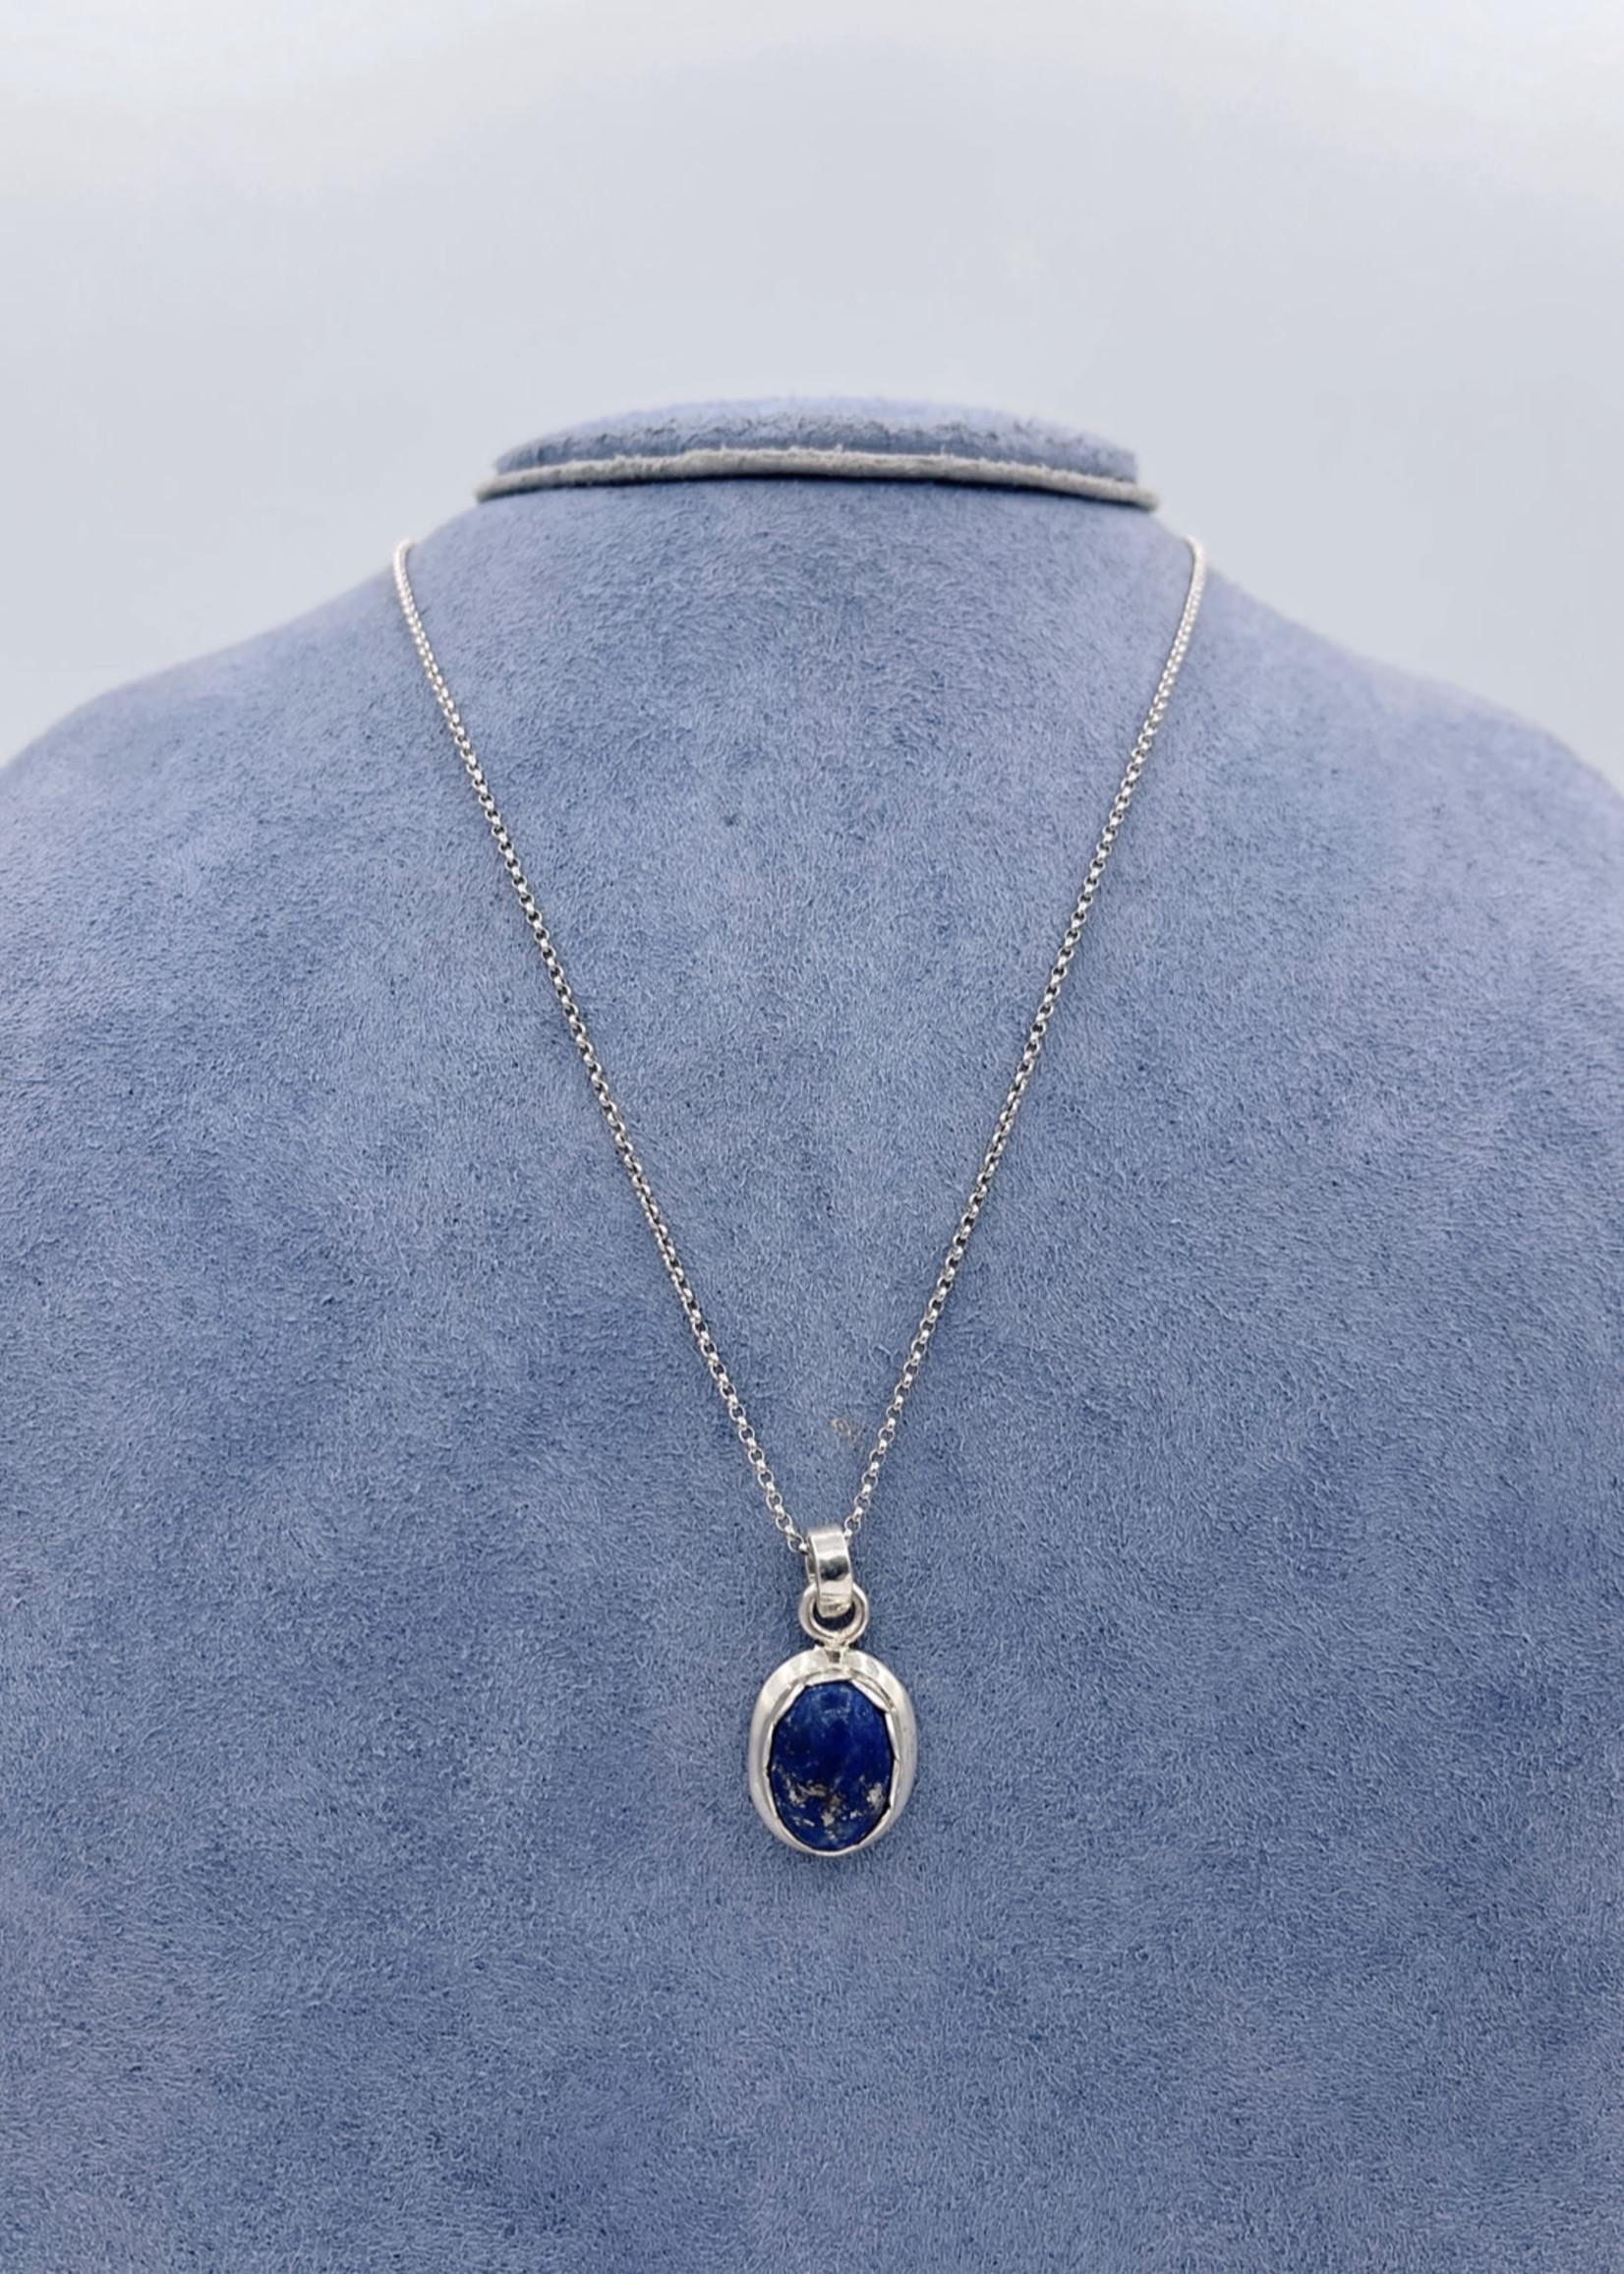 CJ Designs ?SS Lapis Necklace w/ Chain